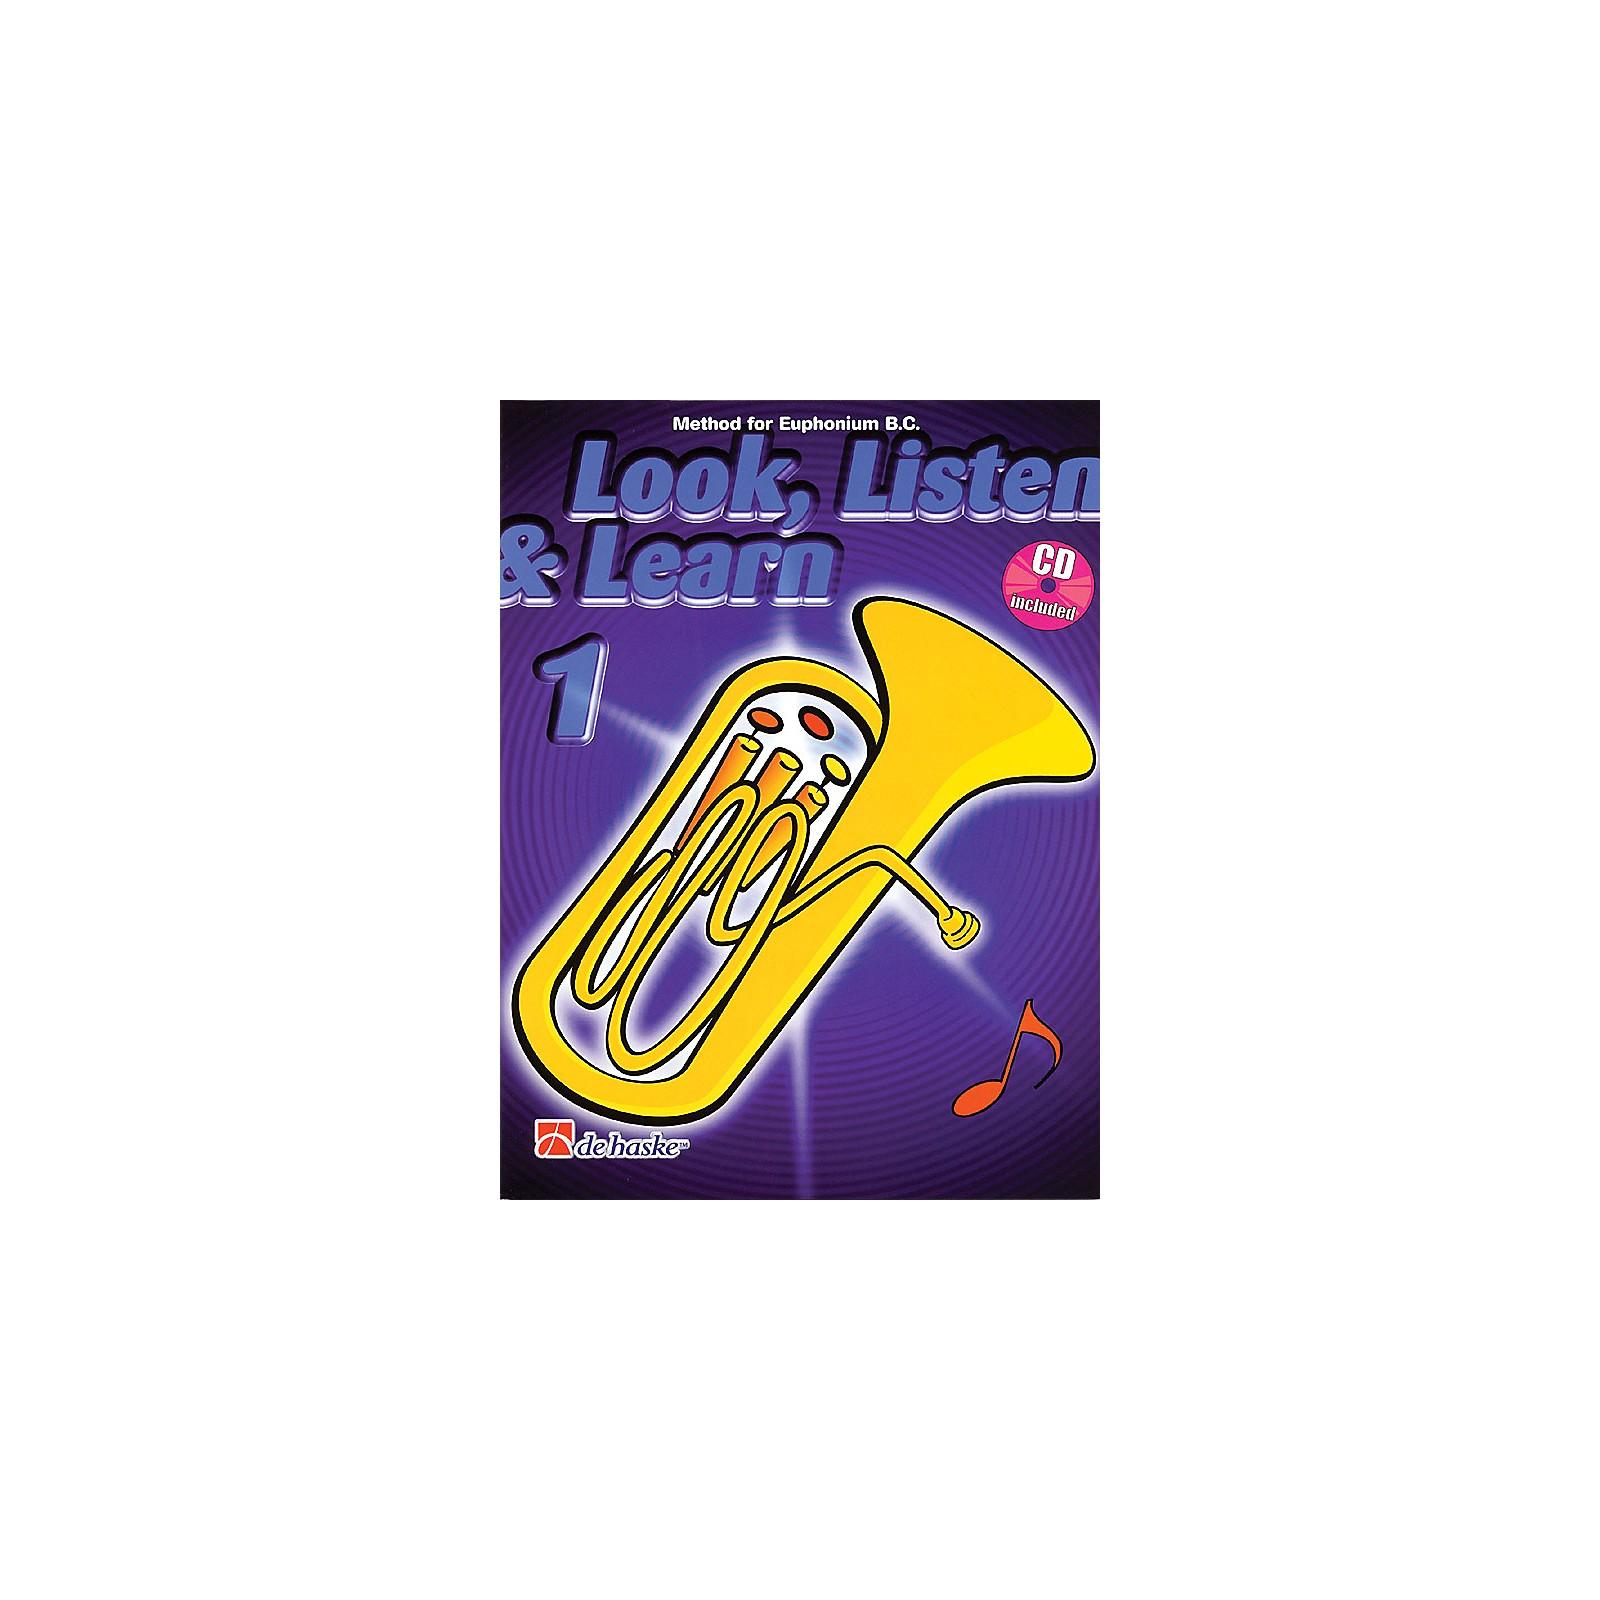 Hal Leonard Look, Listen & Learn - Method Book Part 1 (Euphonium (B.C.)) De Haske Play-Along Book Series